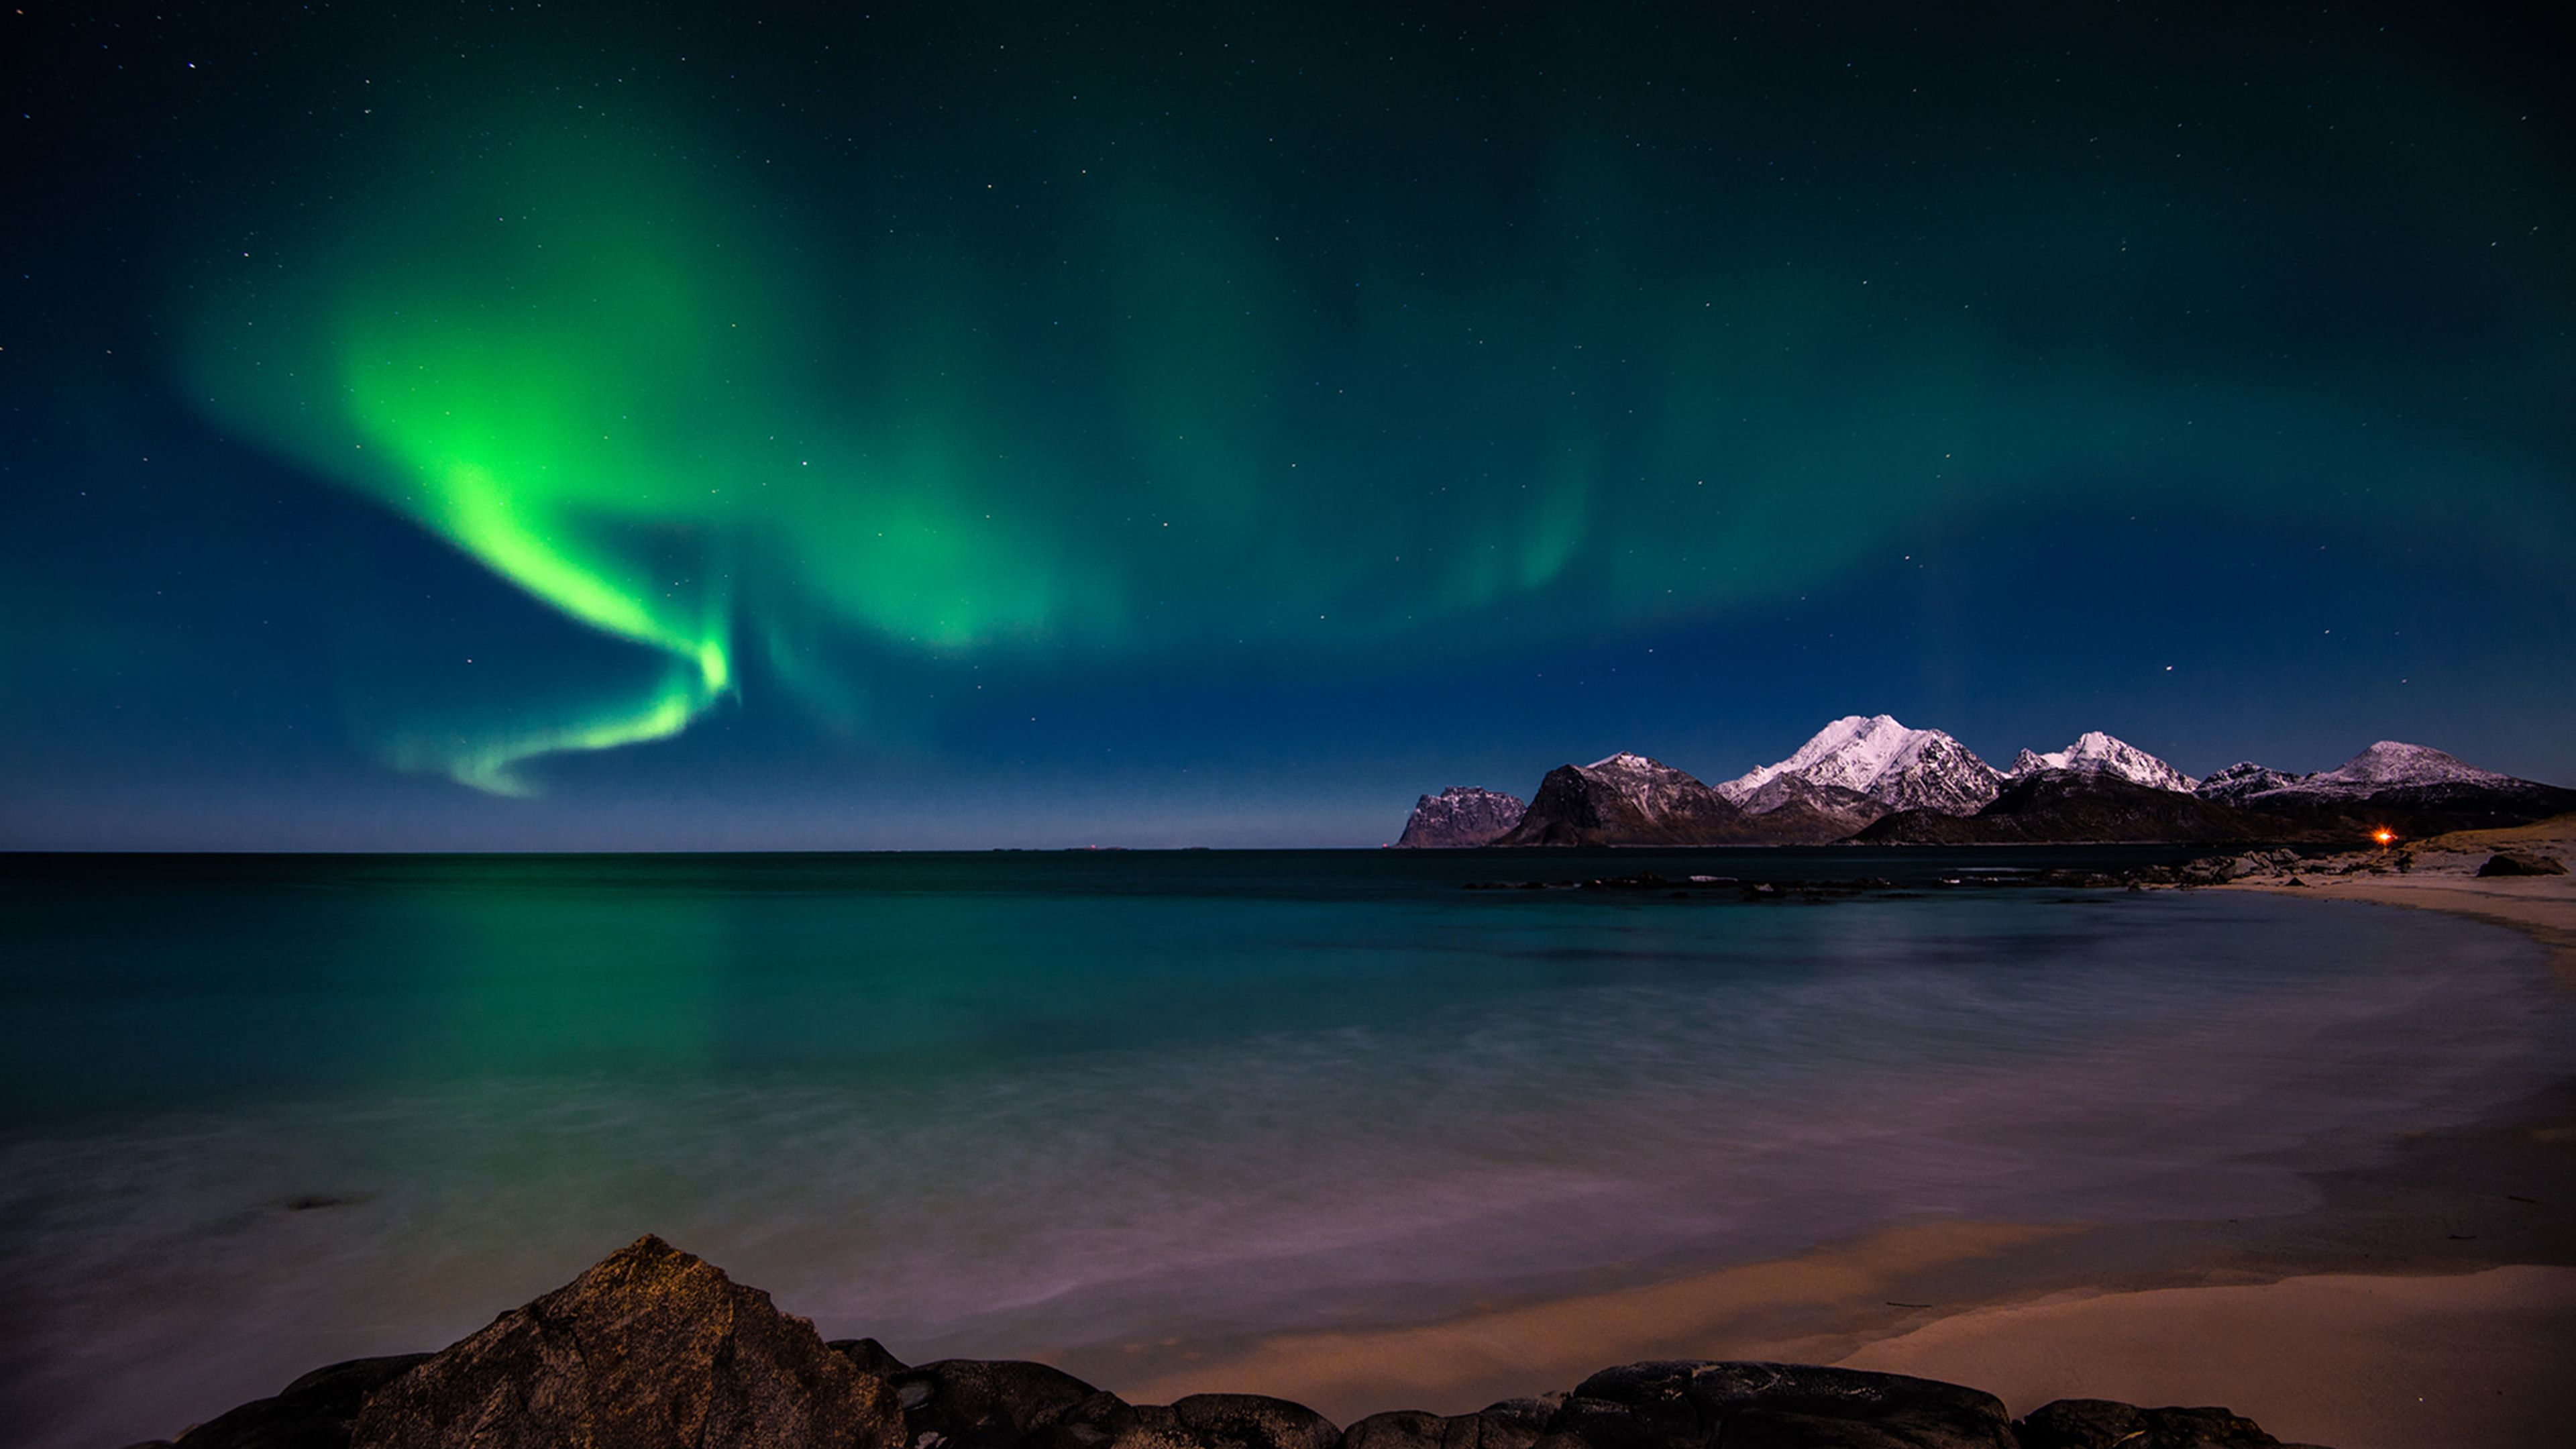 Aurora borealis hd desktop wallpaper high definition hd for Sfondi desktop aurora boreale